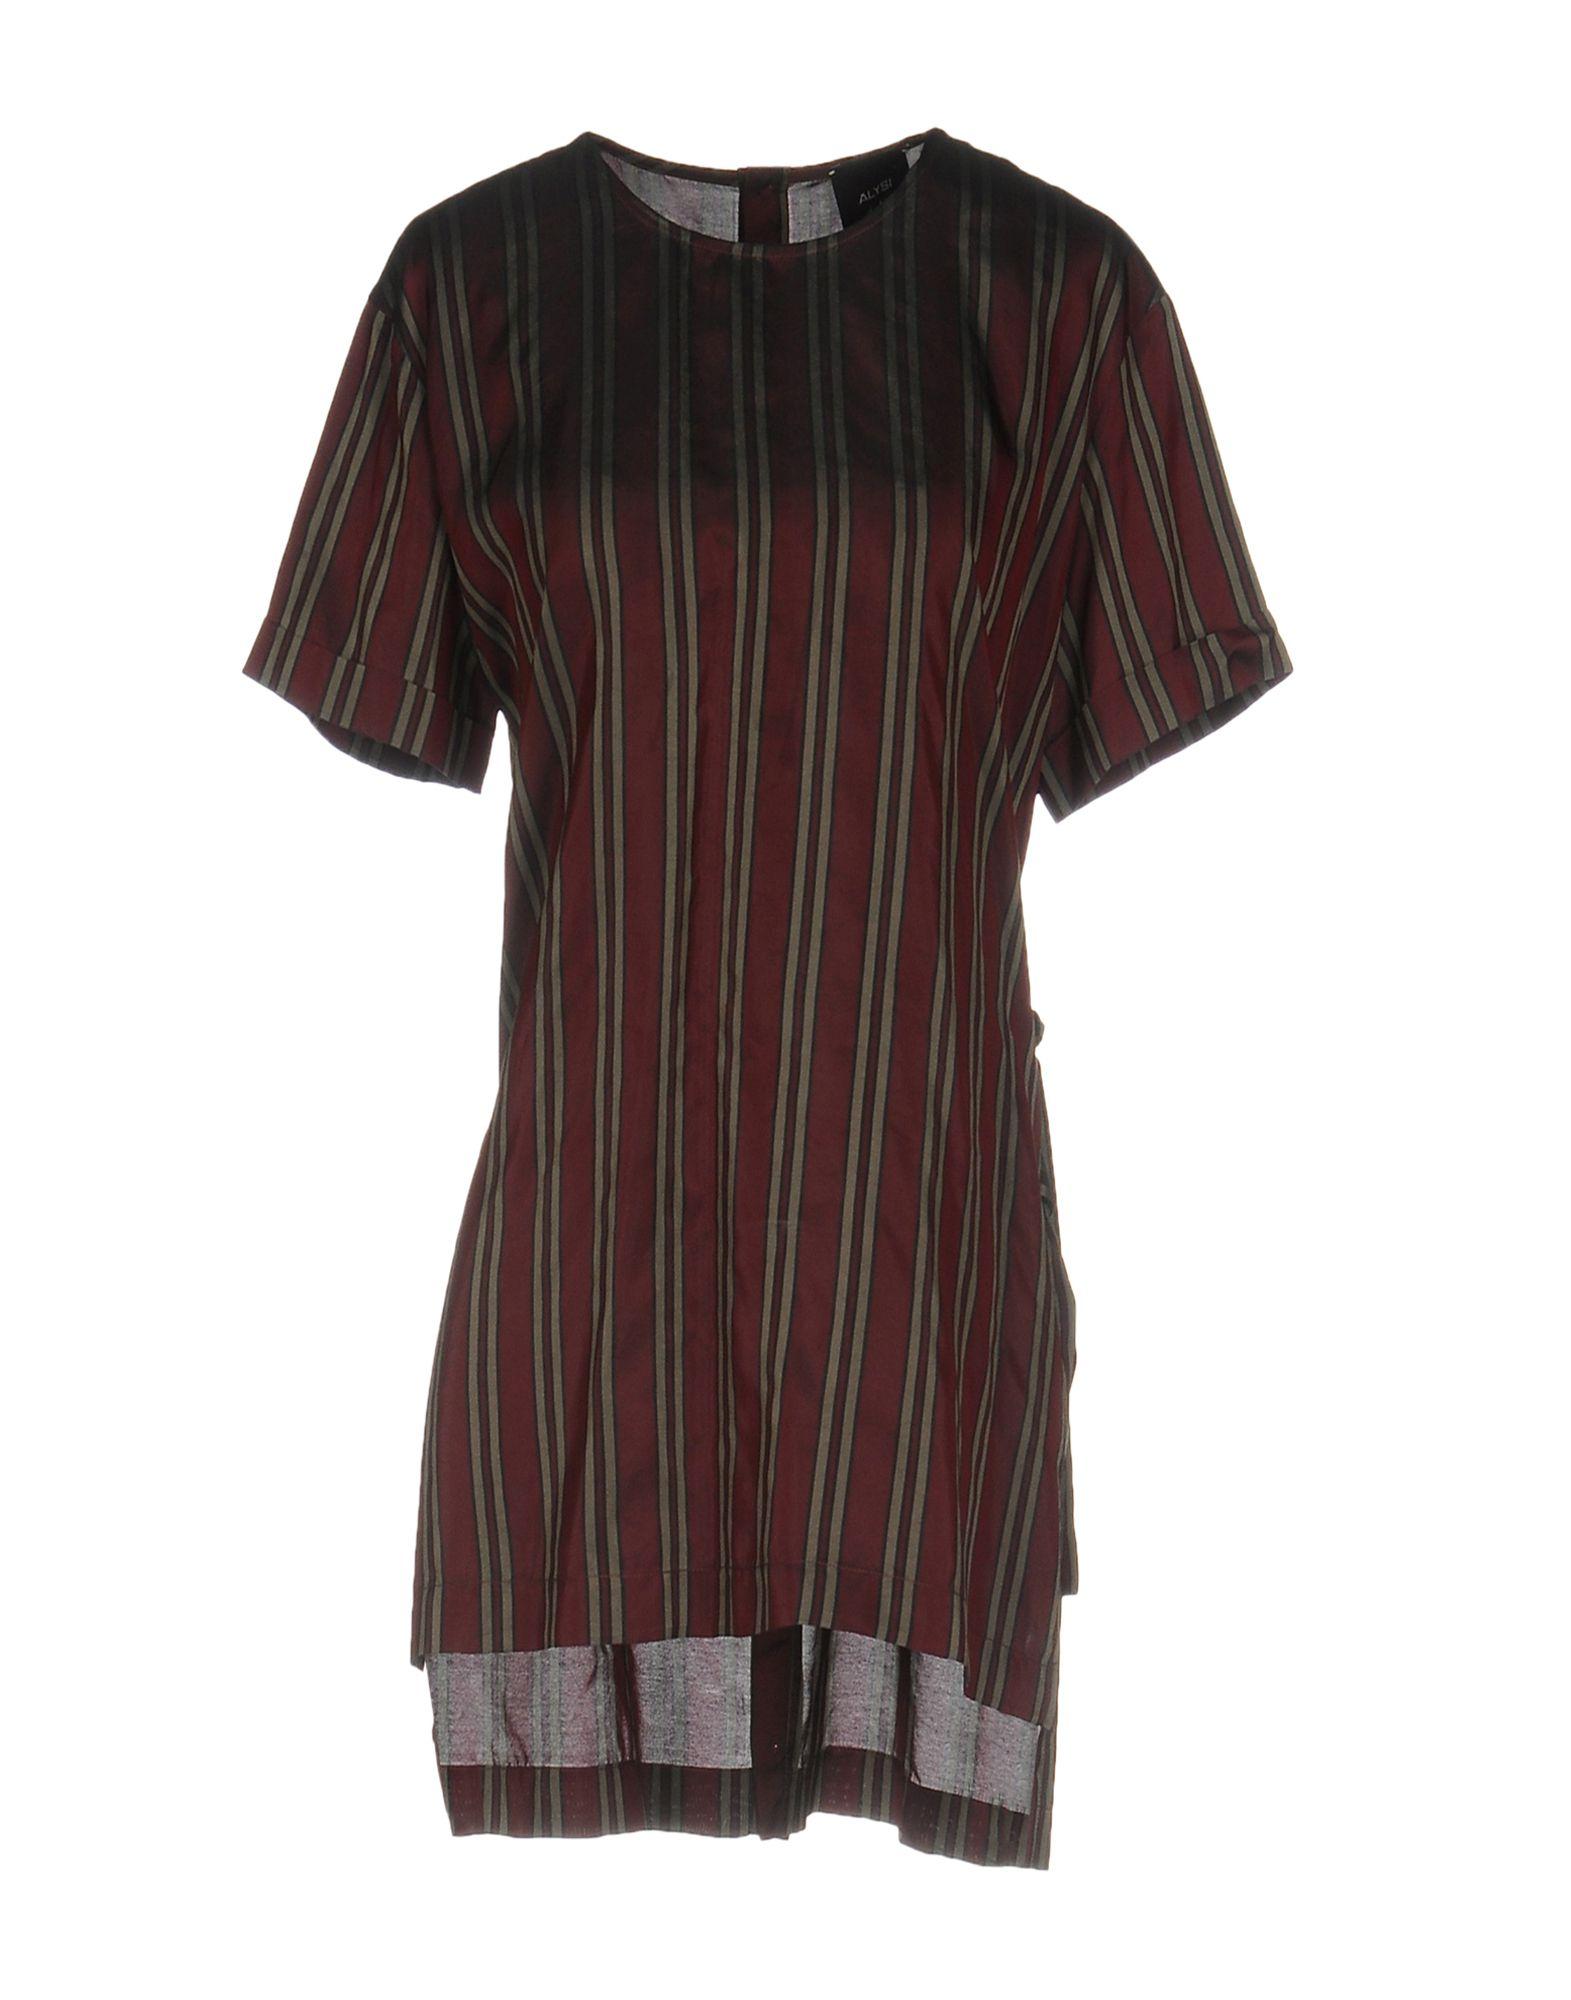 ALYSI Блузка блузка с рисунком короткие рукава вырез сзади